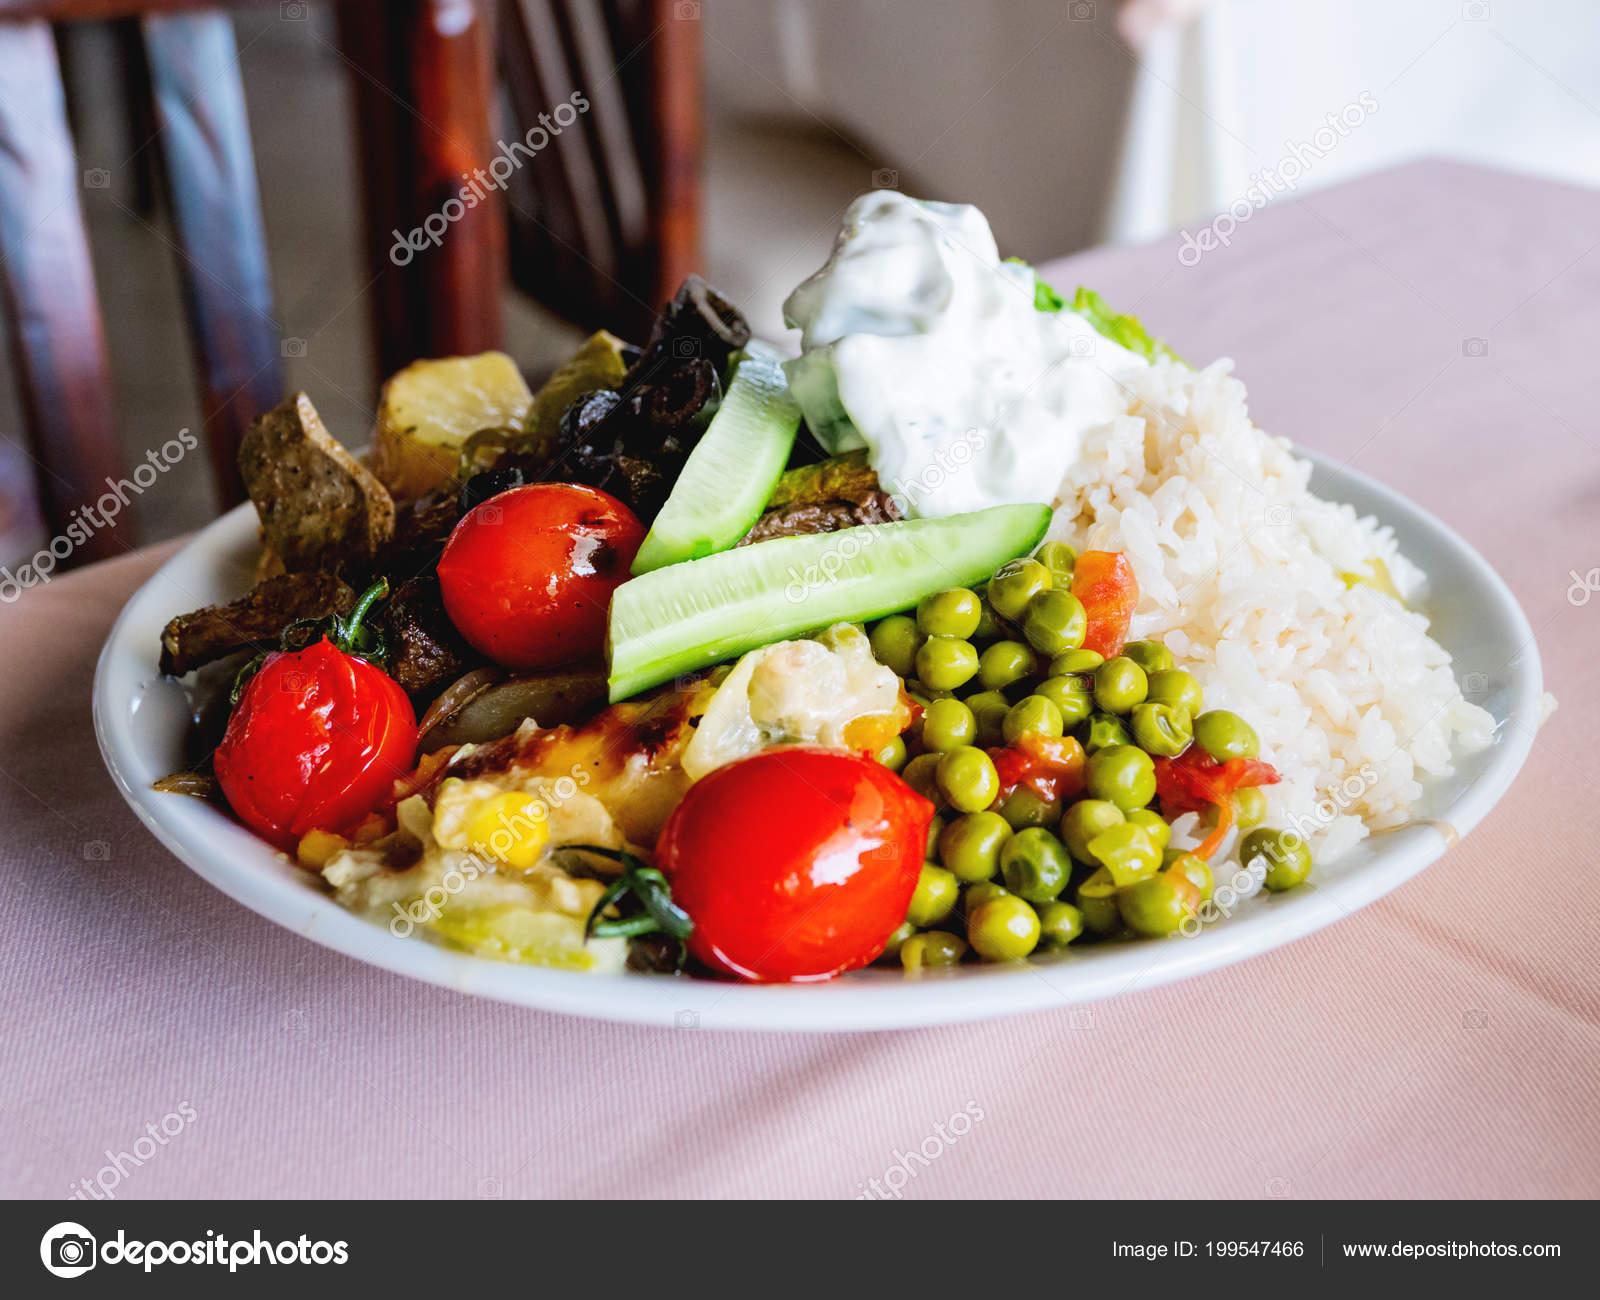 Healthy Dinner Plate Full Stewed Vegetables Rice Meat Natural Yogurt Stock Photo